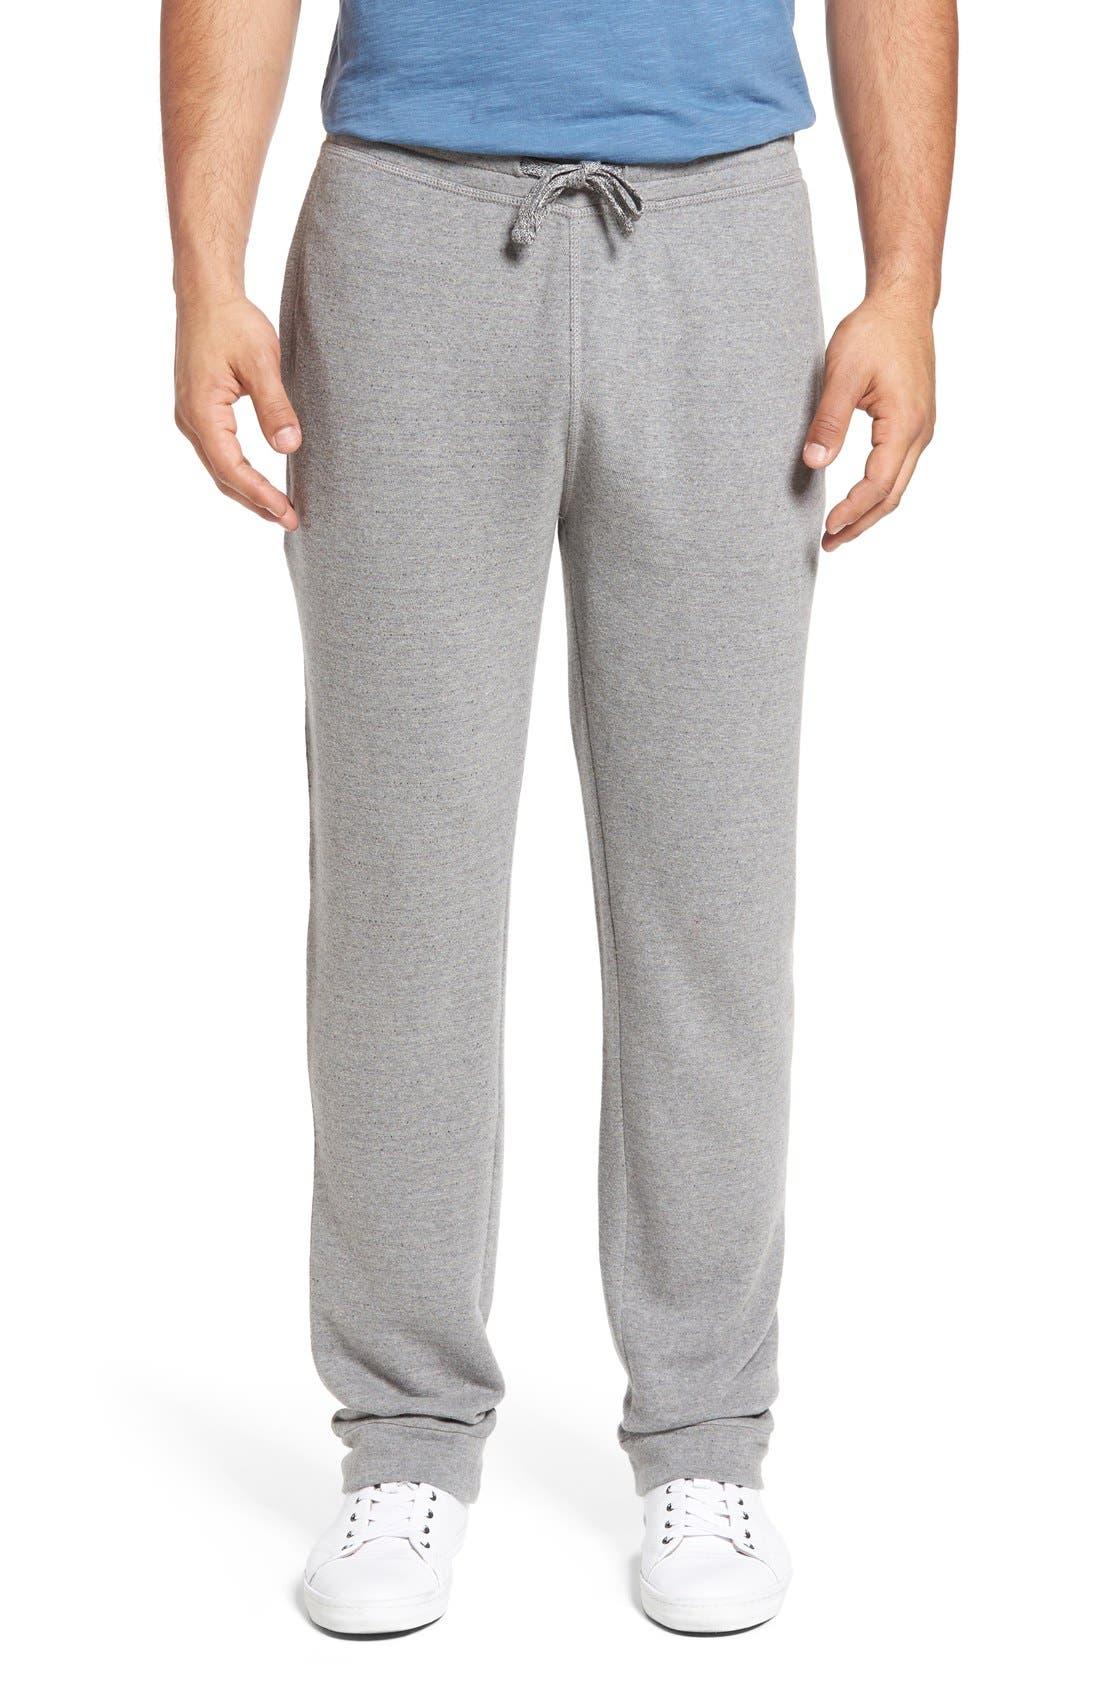 Cutter & Buck 'Gleann' Knit Pants